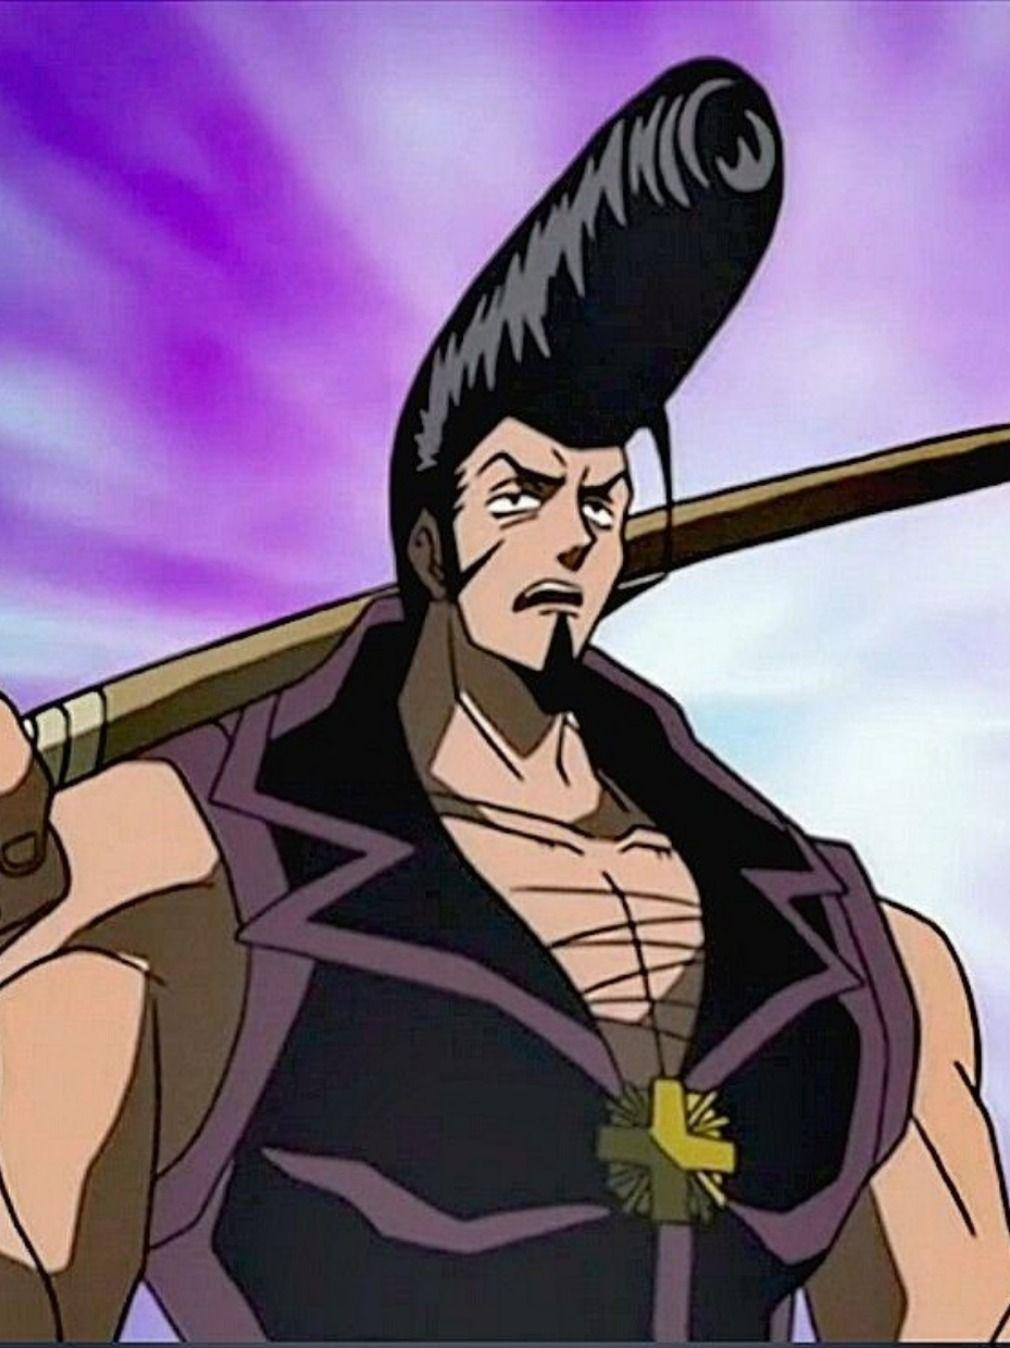 Wooden Sword Rio Anime Shaman King Birthday